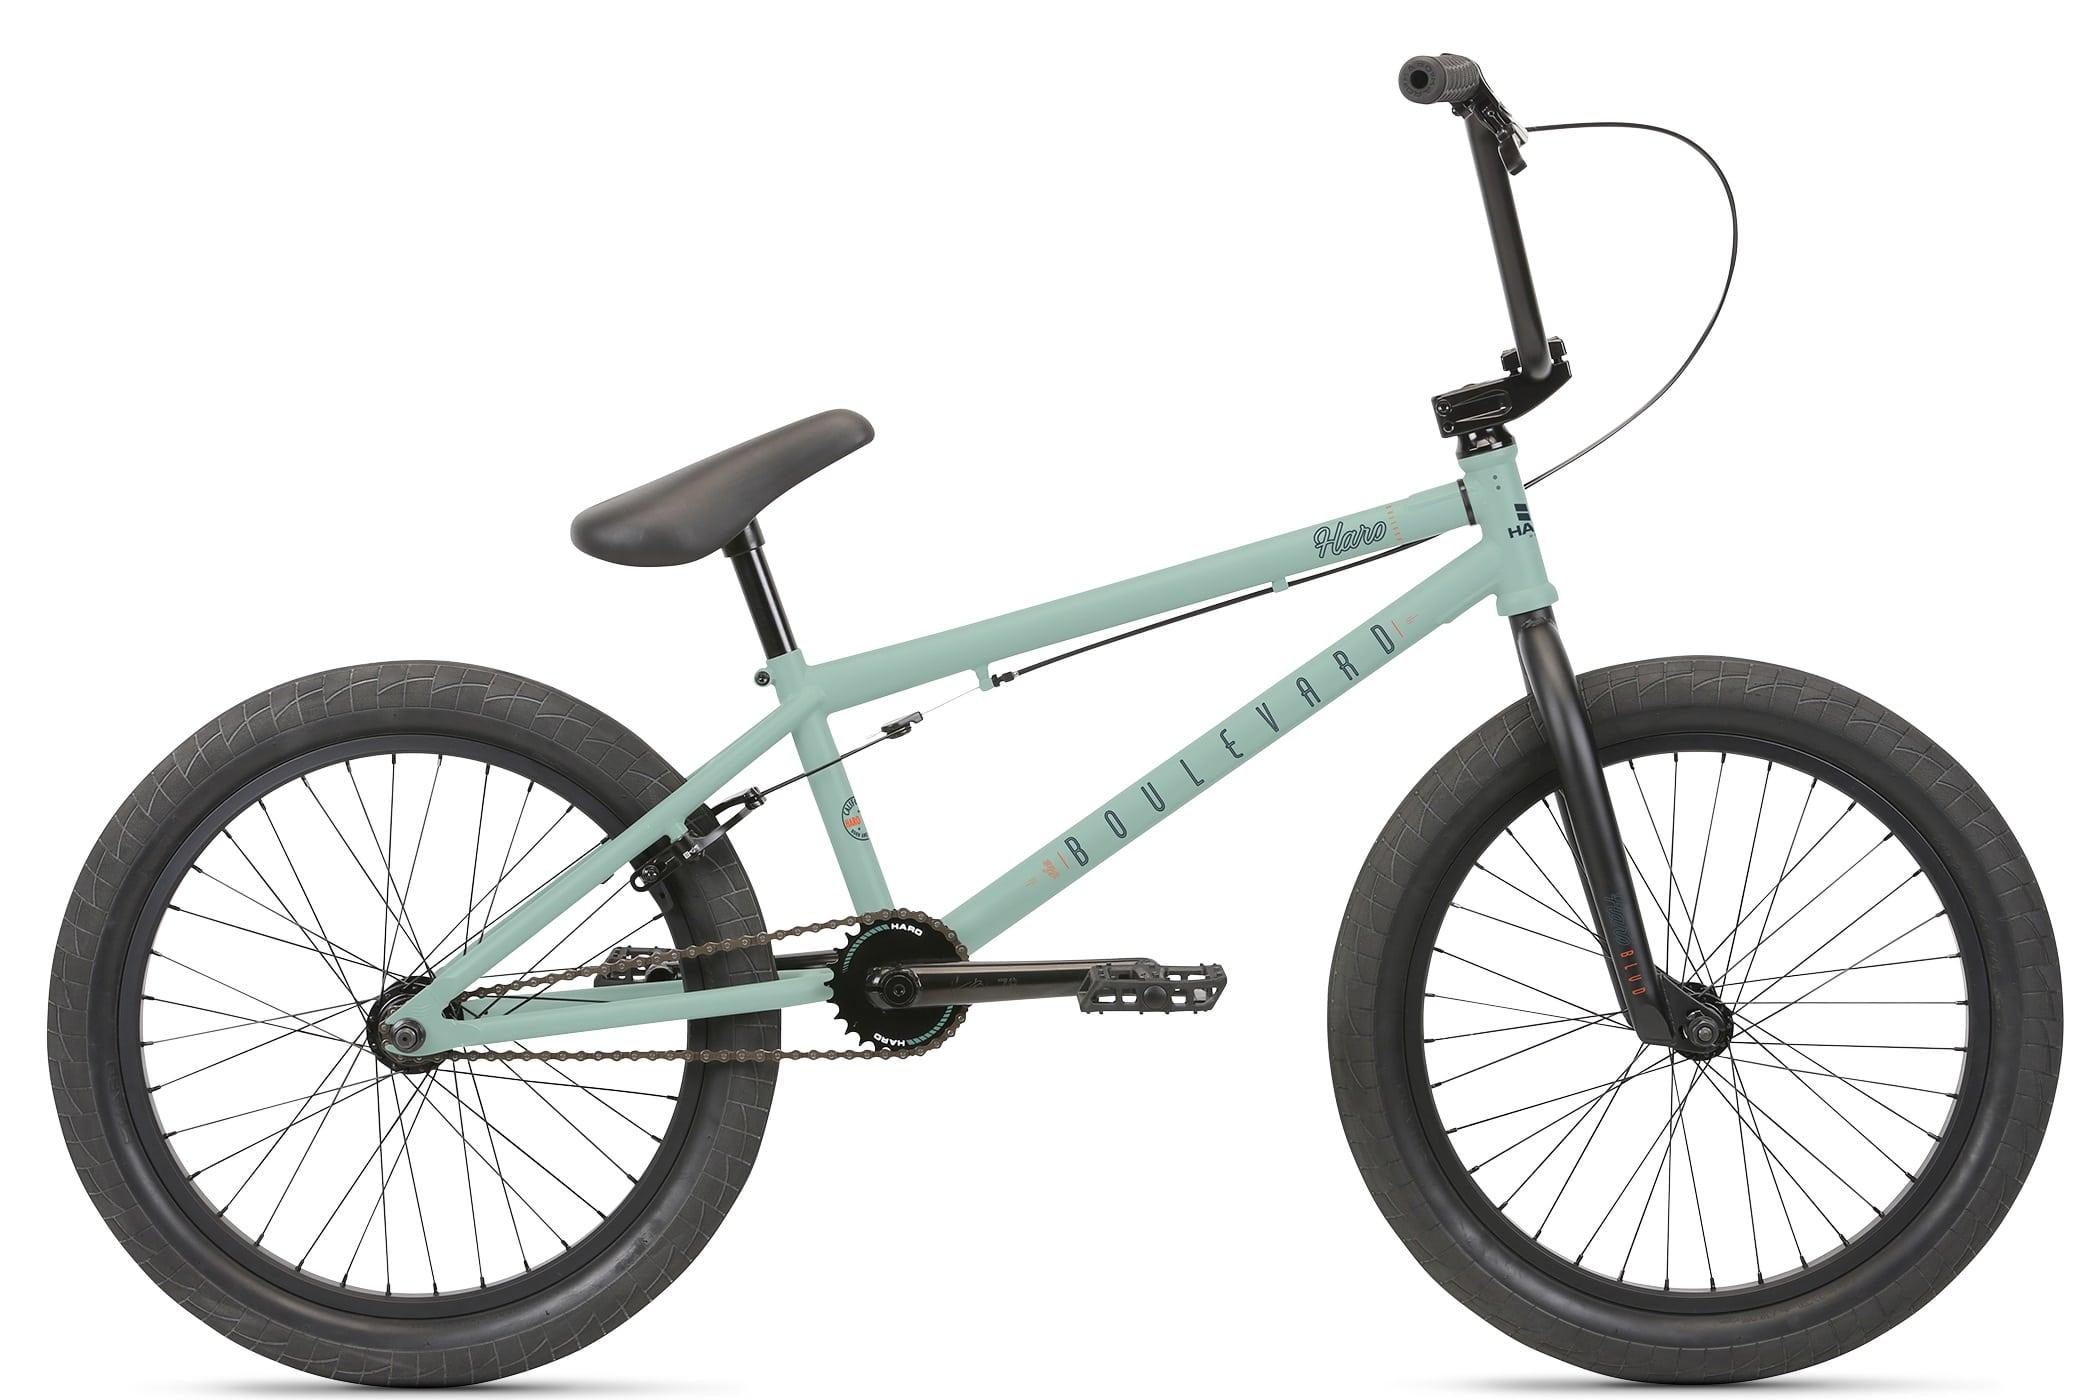 Haro Ποδήλατο Bmx Downtown - Ποδήλατα BMX